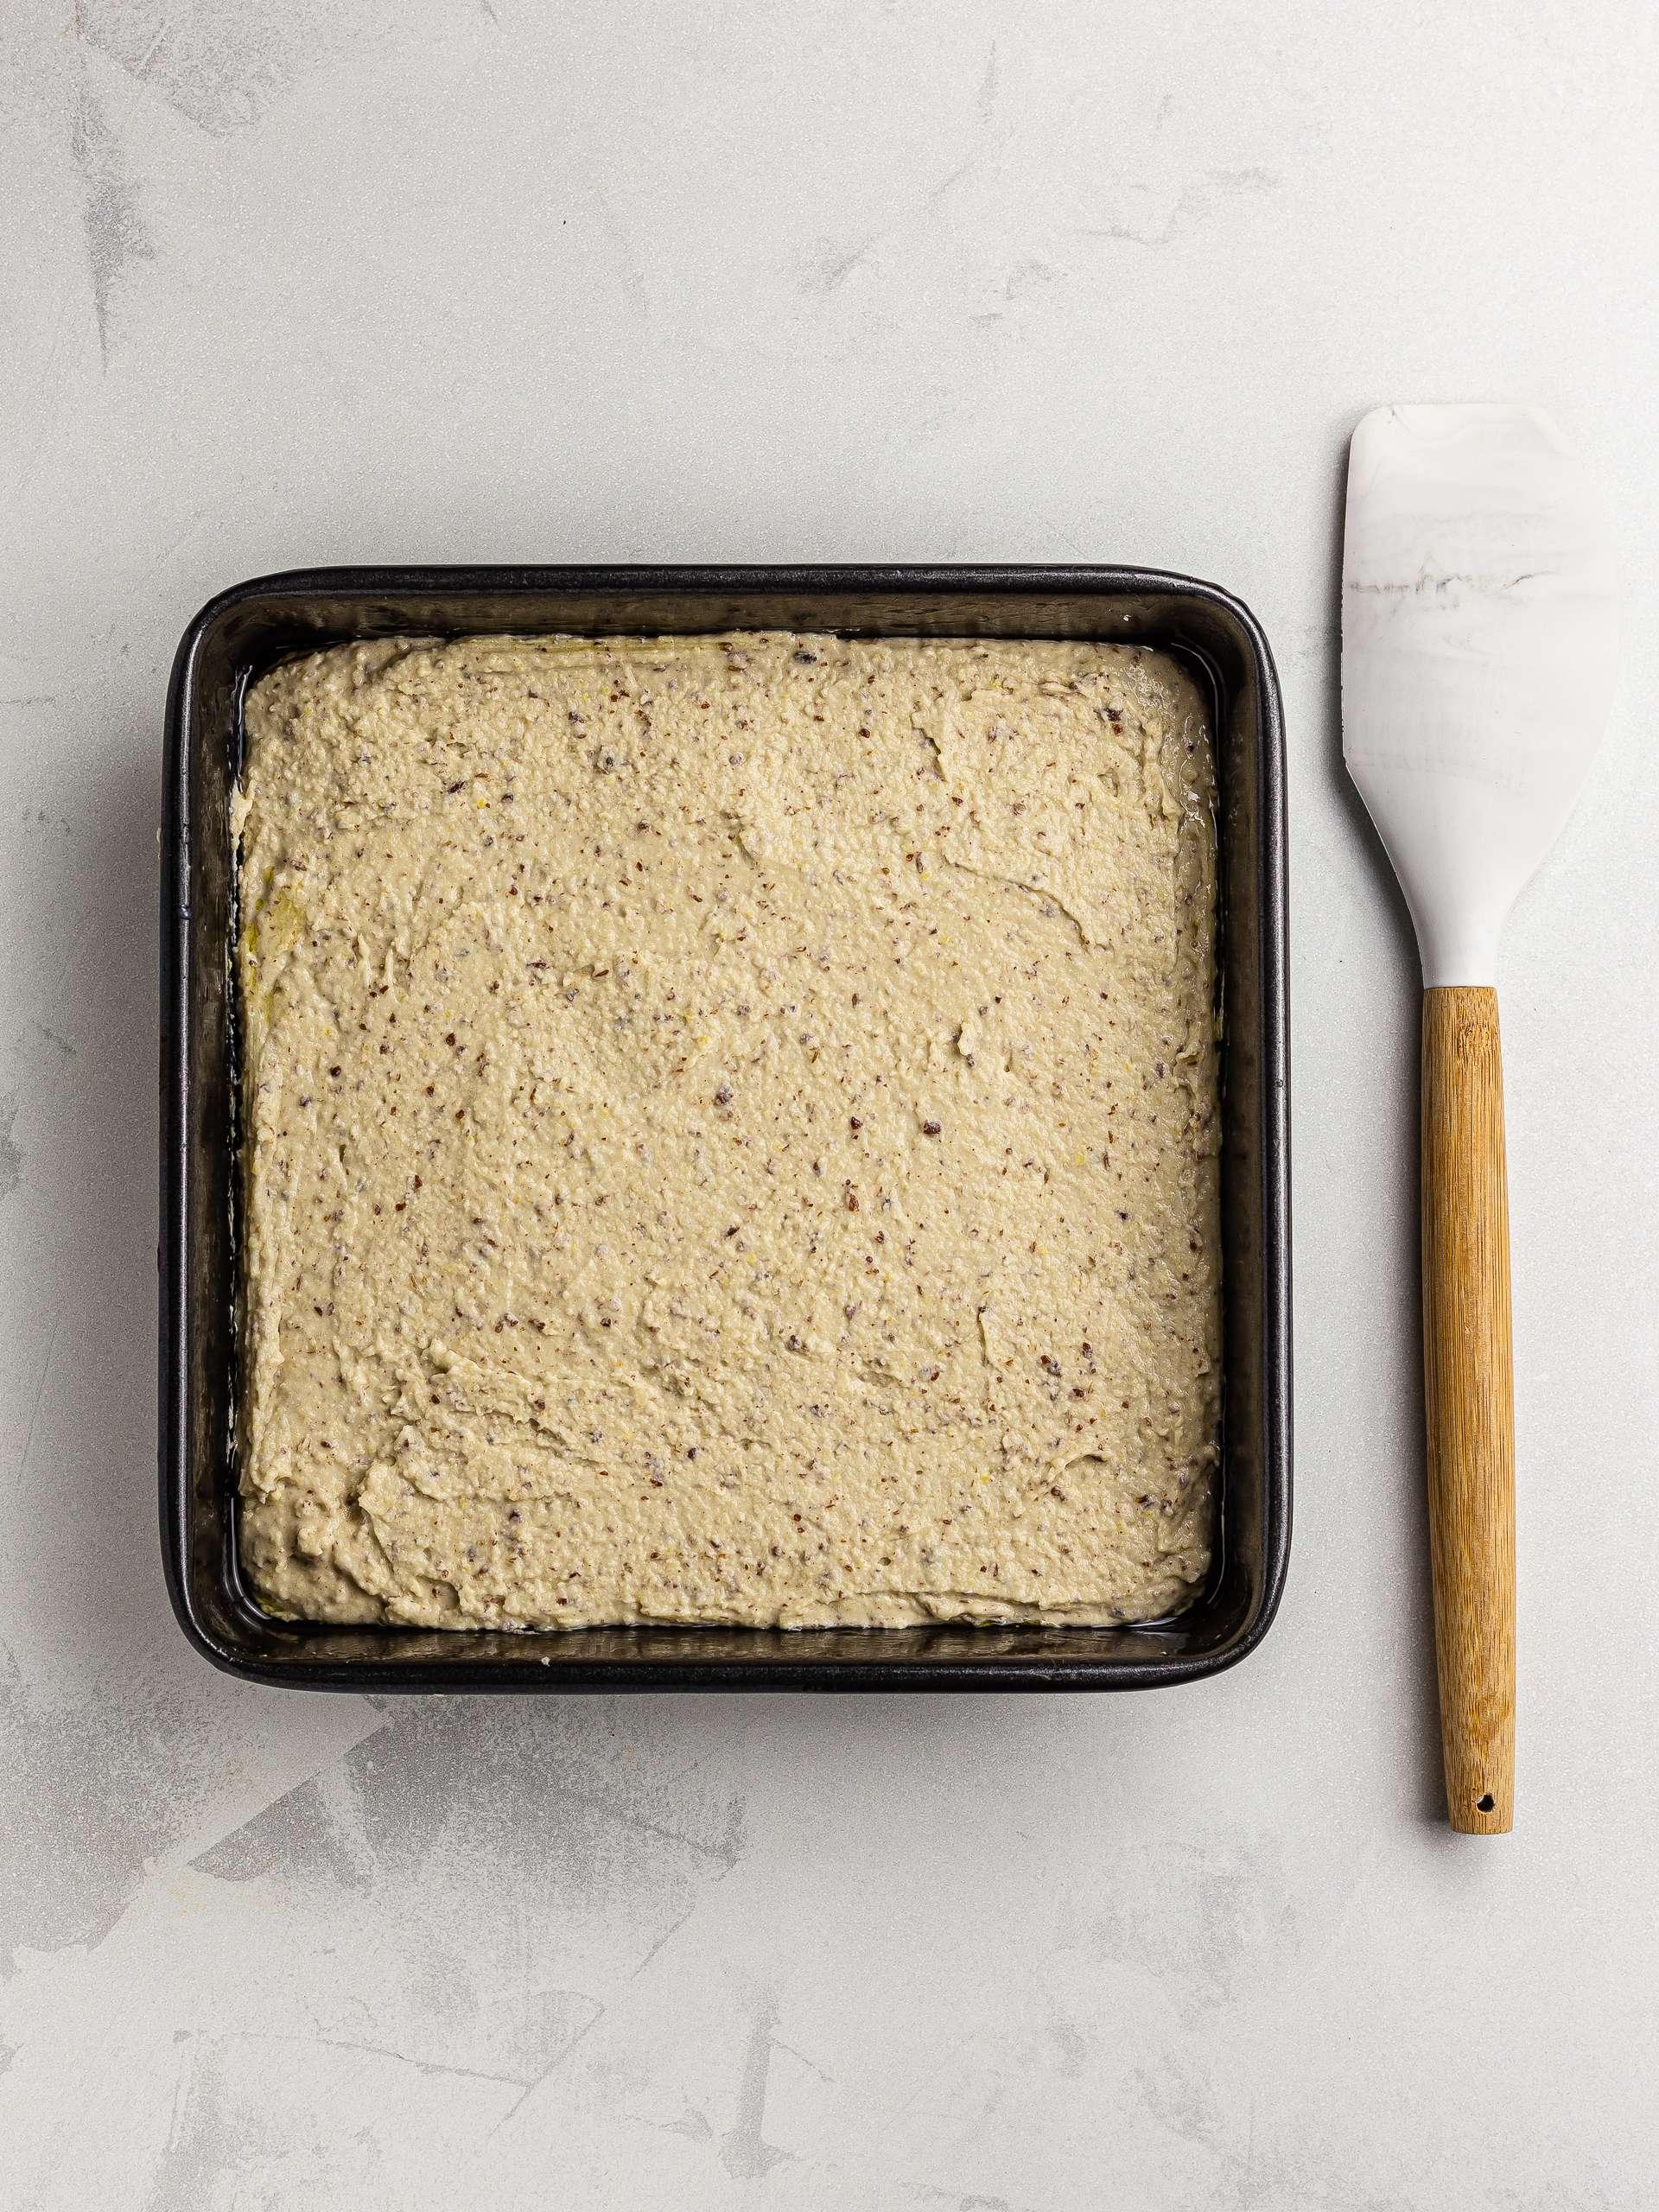 baking tin for lamington cake batter